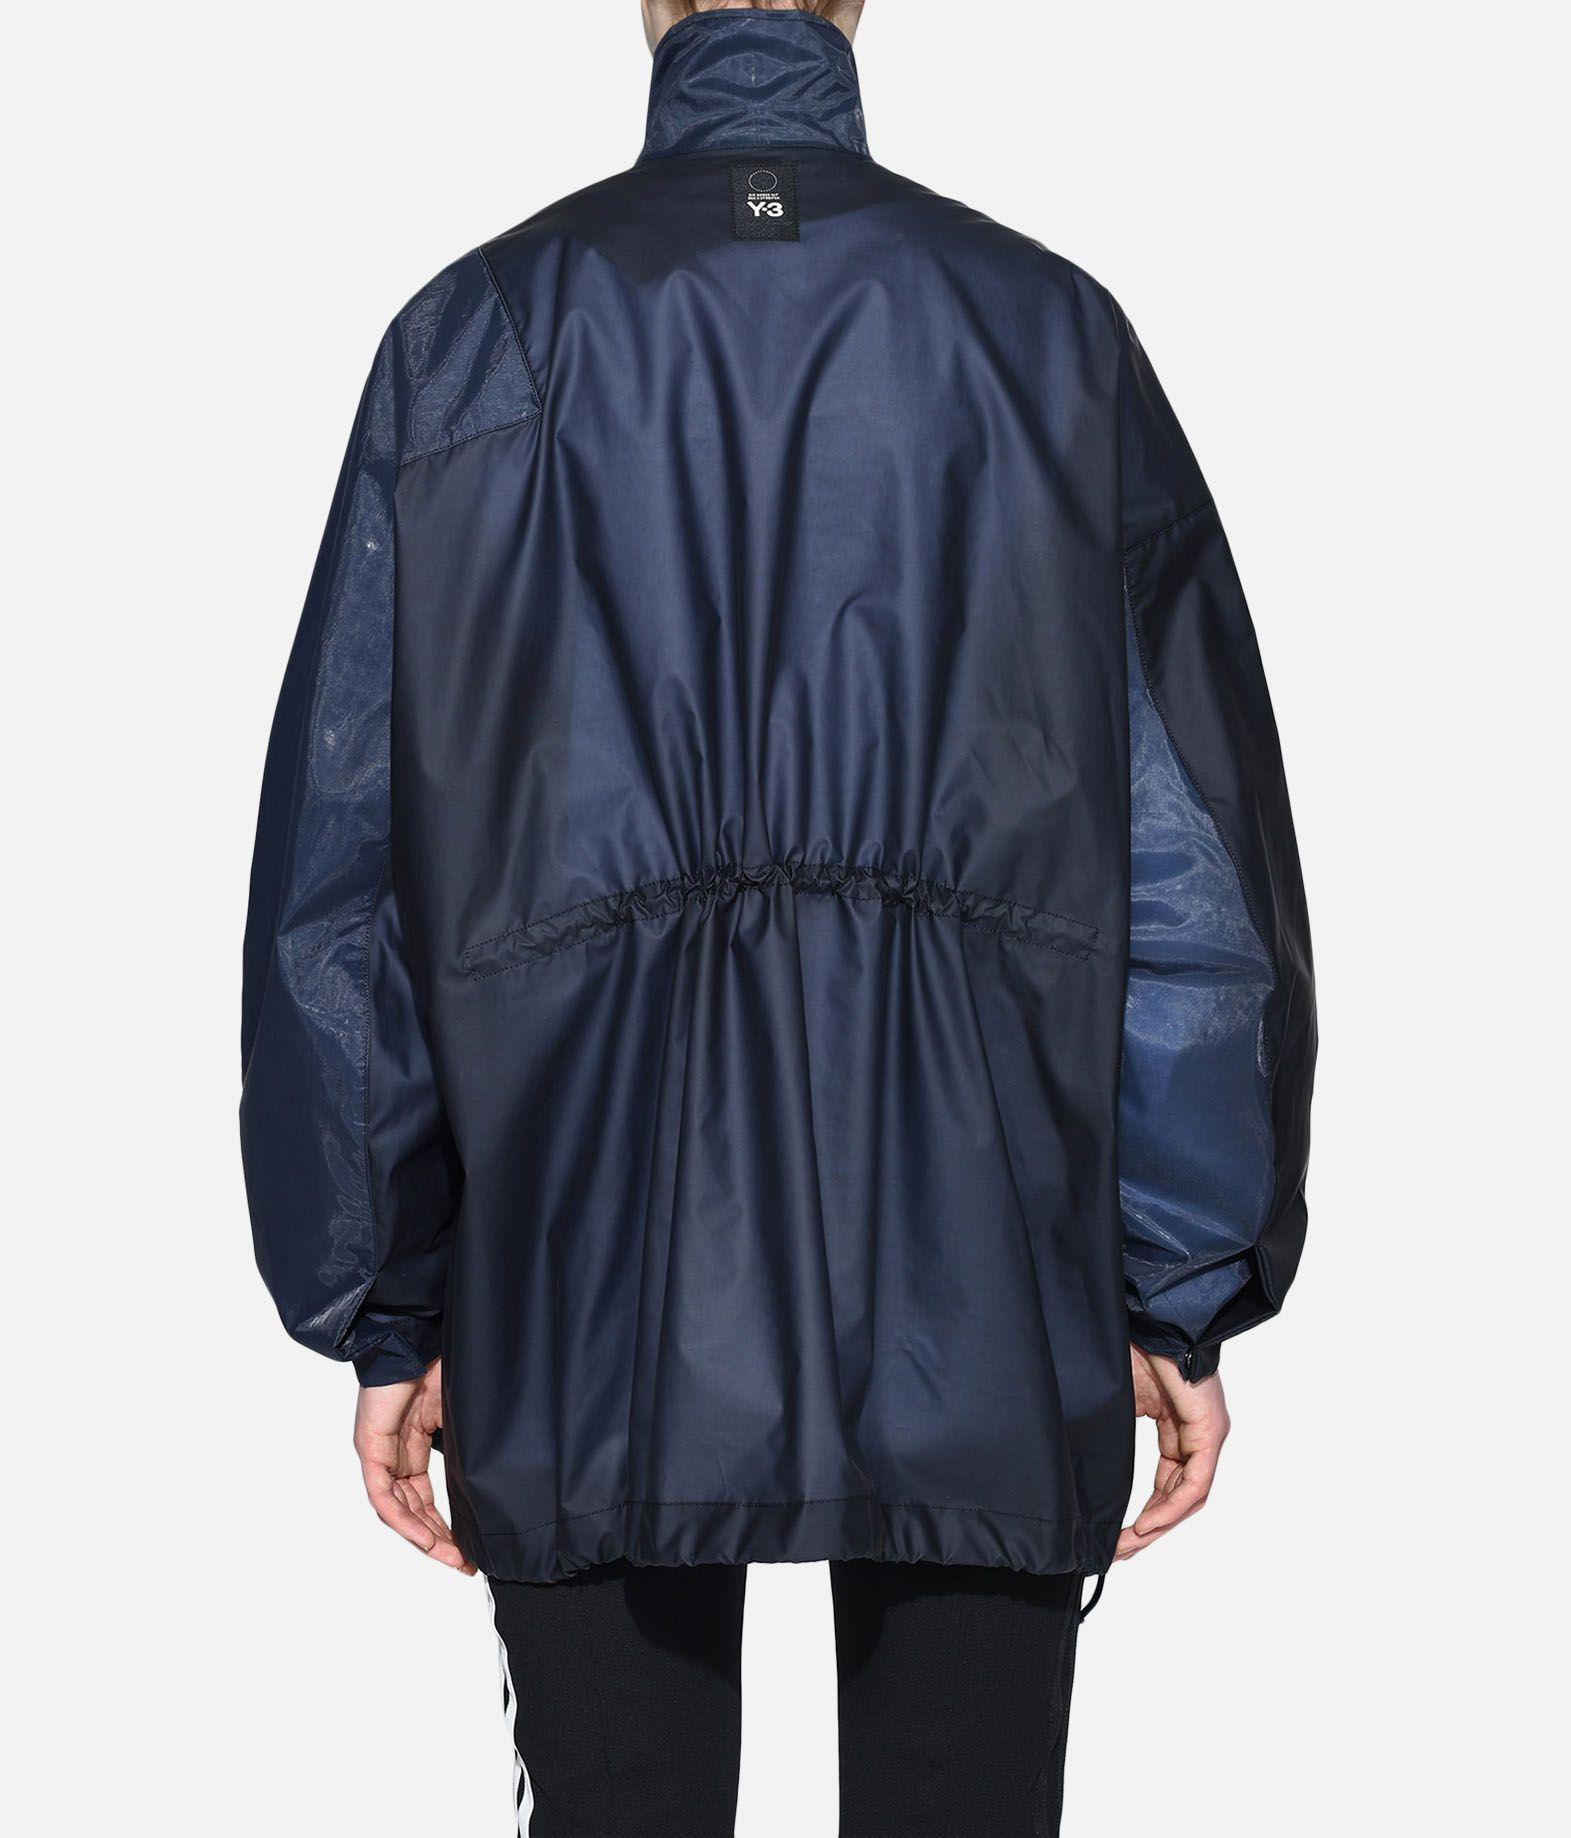 Y-3 Y-3 Patchwork Anorak Jacket Jacket Woman d